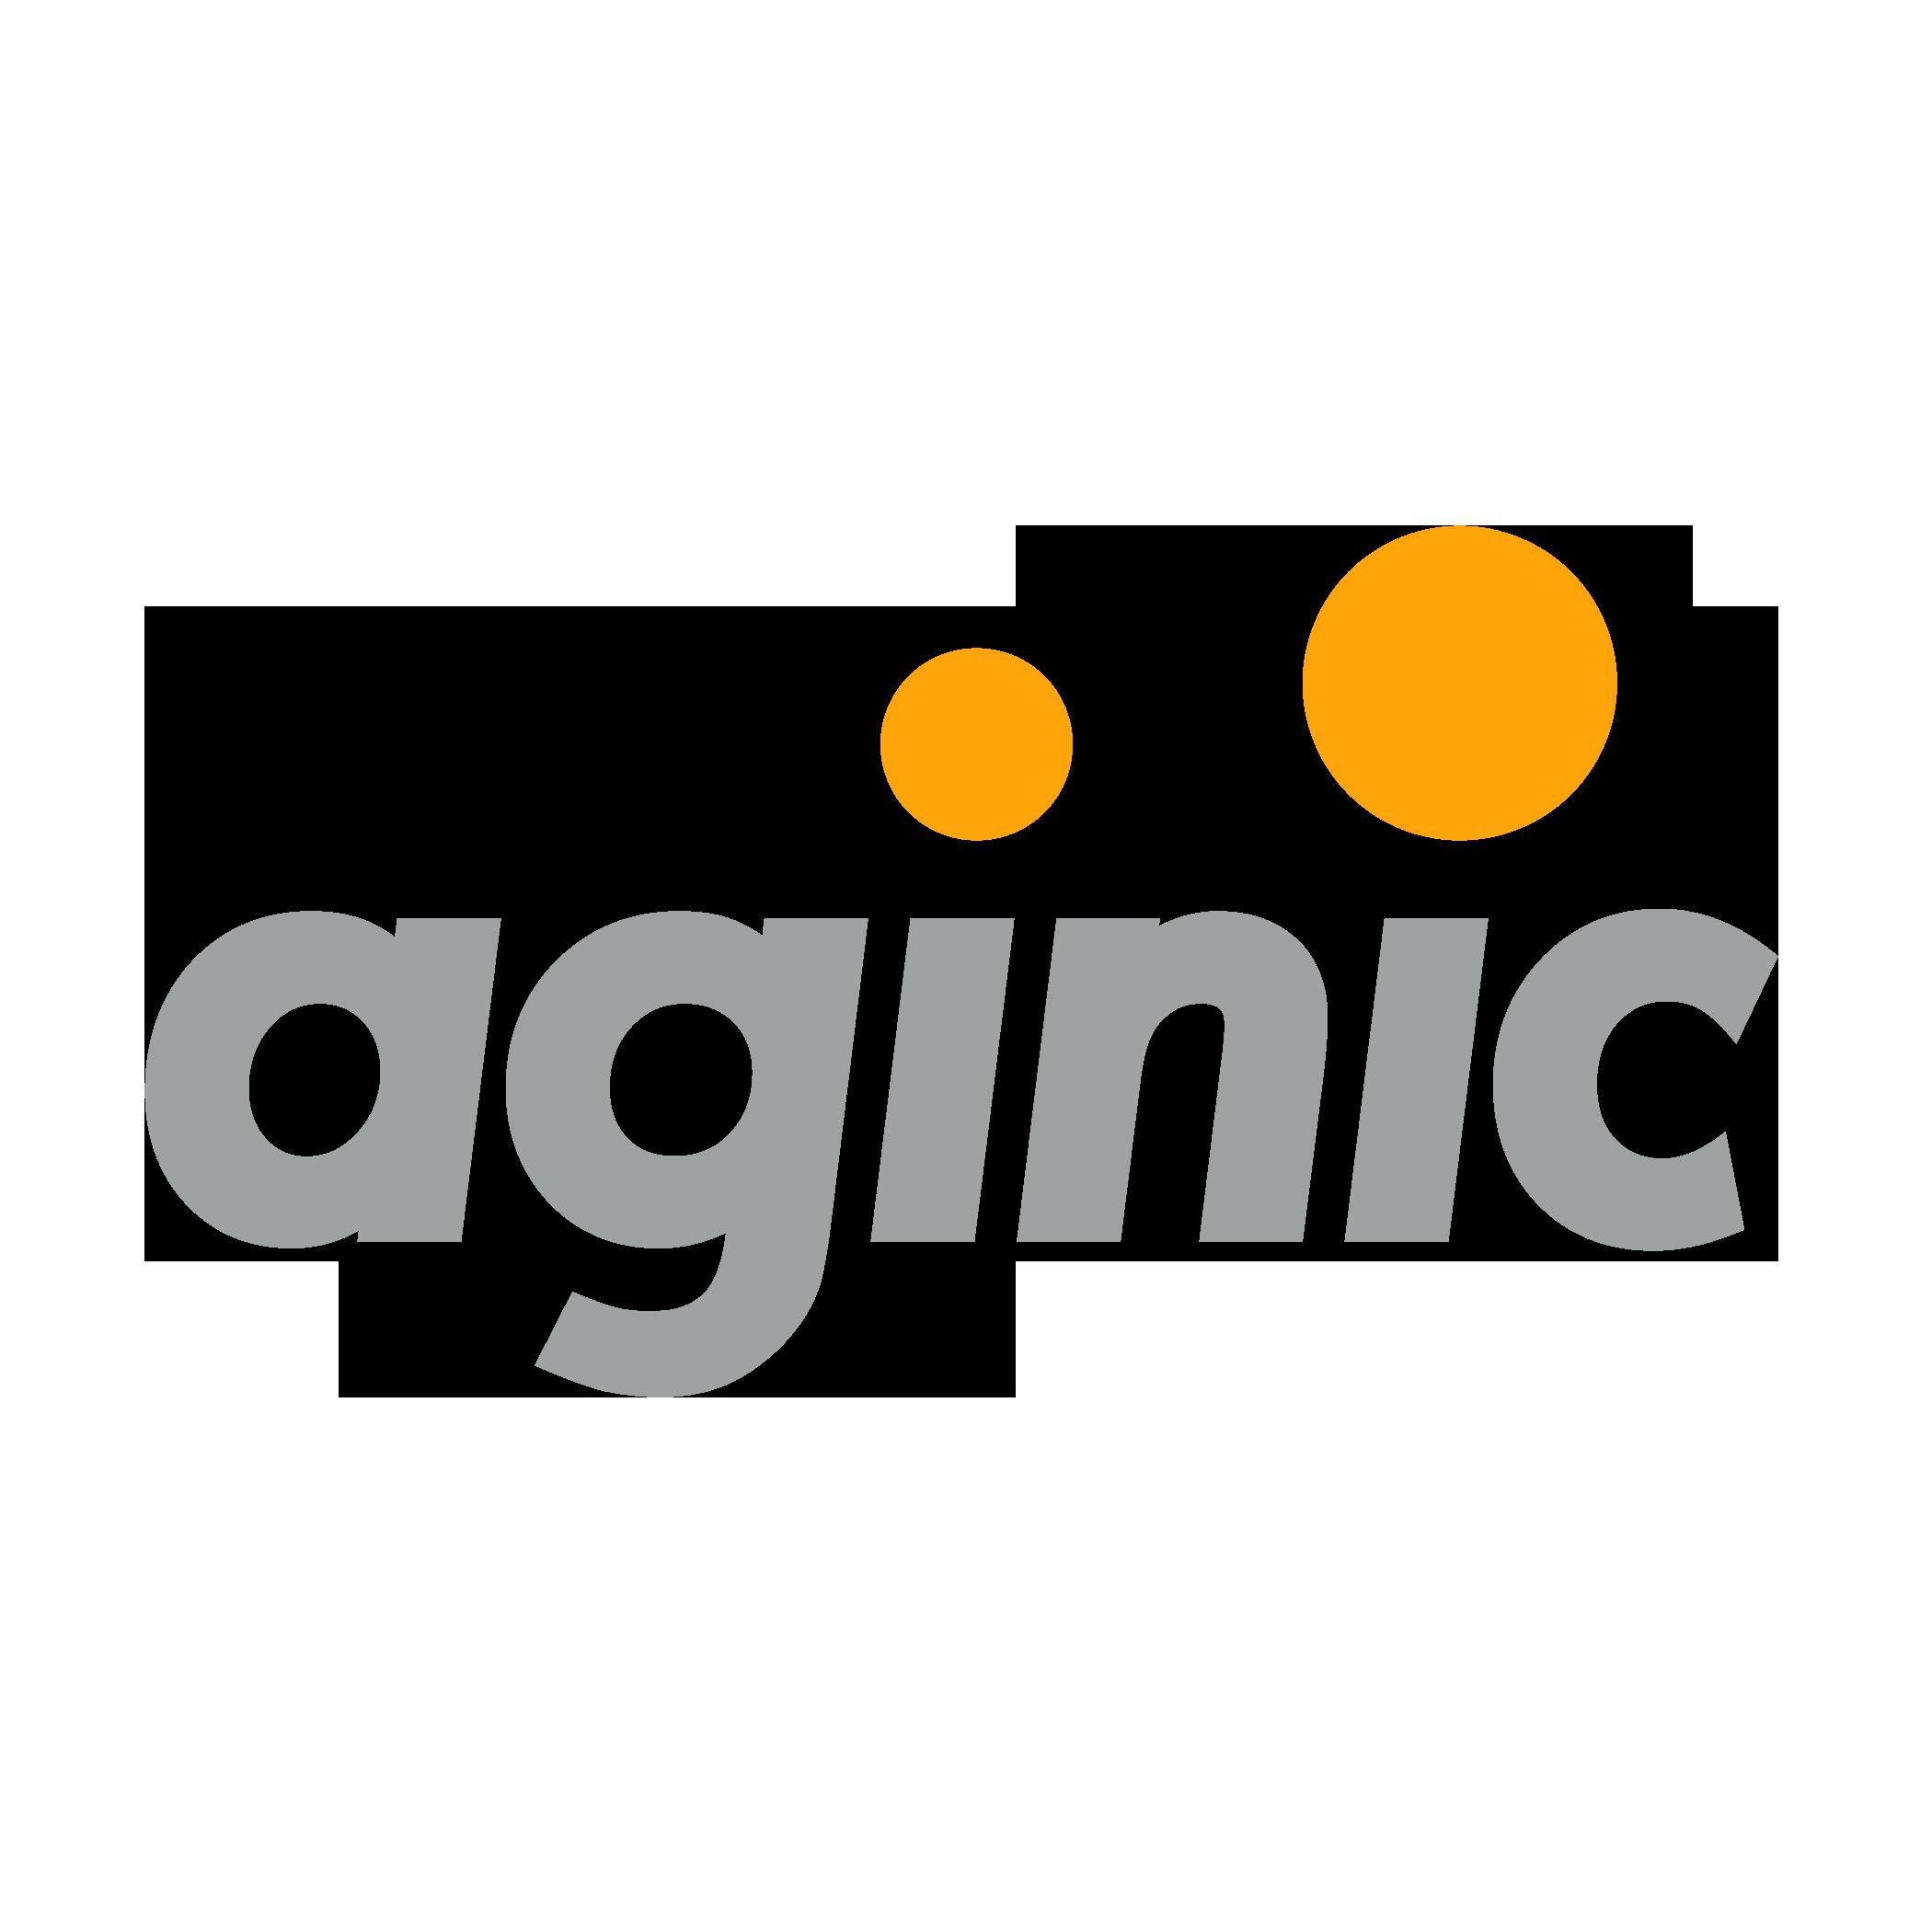 Aginic_logo_square.png